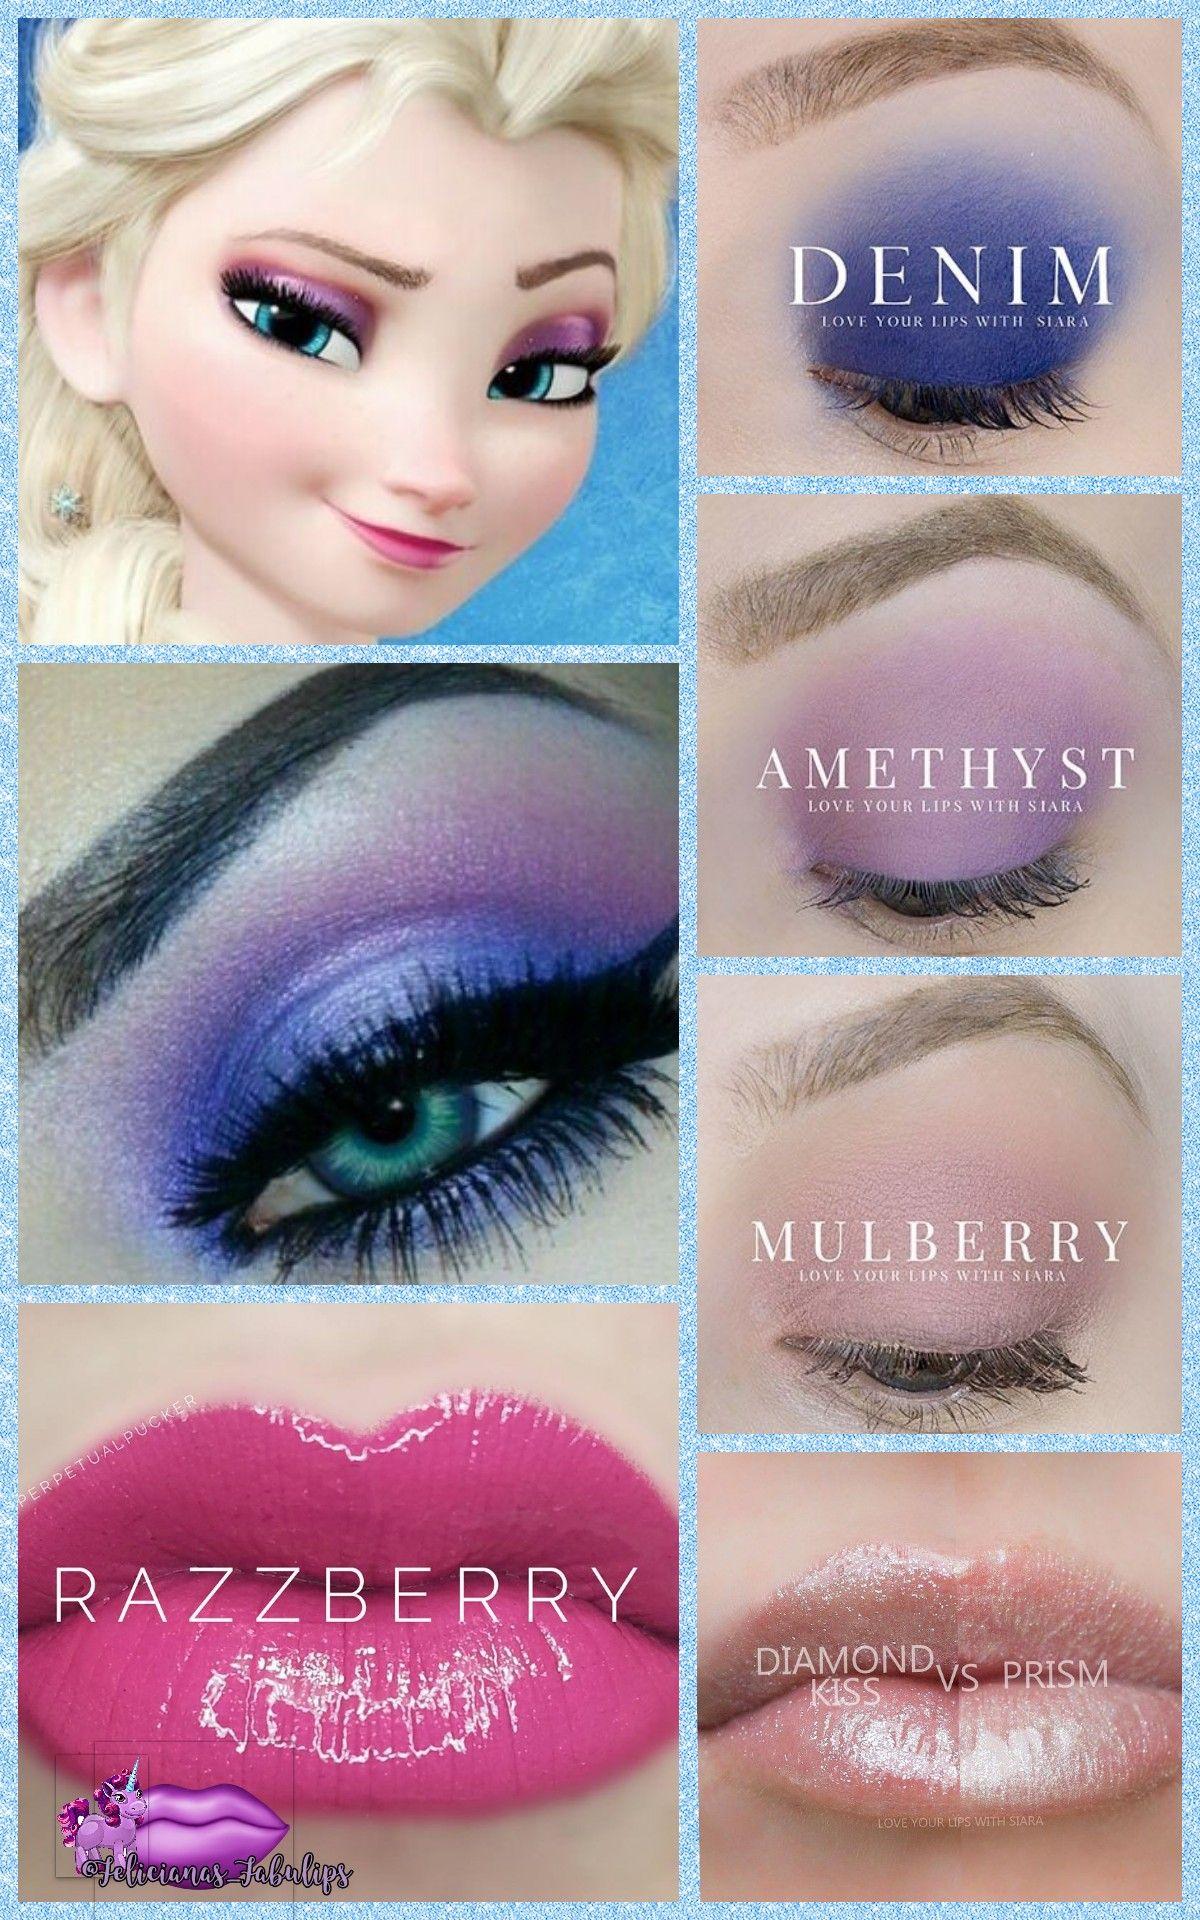 You Can Replicate This Beautiful Frozen Look To Look Like Elsa Magical Disney Looks Denim Amethyst Mul Disney Princess Makeup Frozen Makeup Elsa Makeup